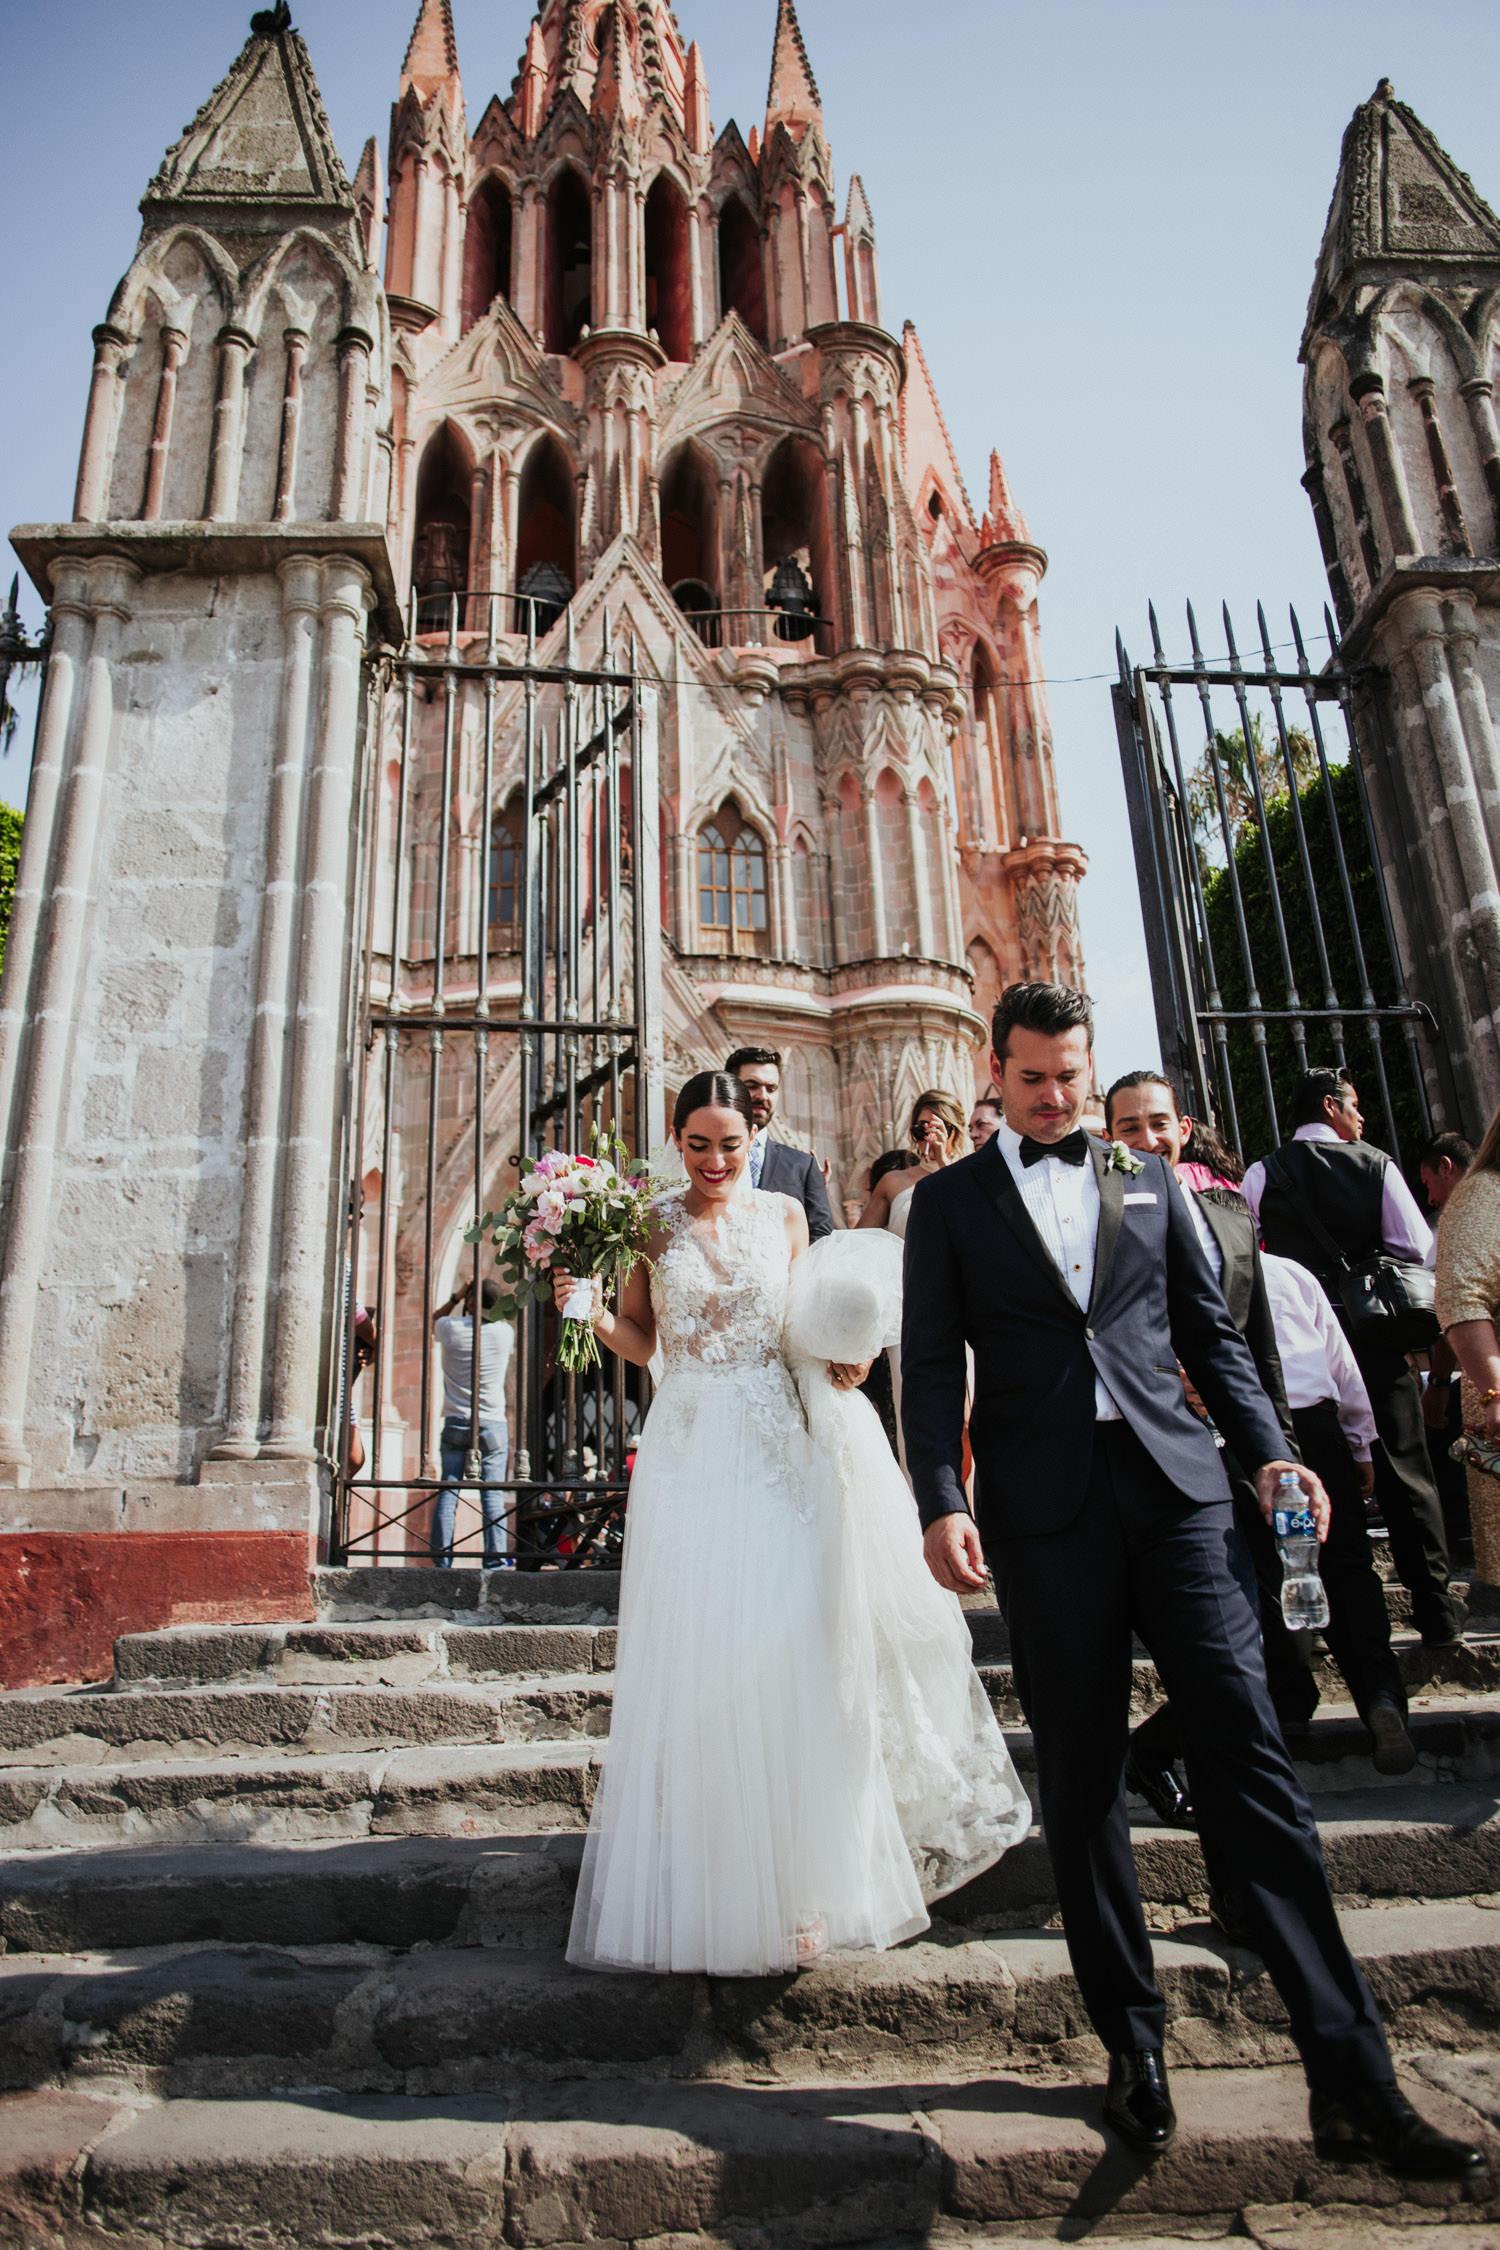 San-Miguel-de-Allende-Wedding-Photography-Parroquia-Instituto-Boda-Fotografia-Fer-Sergio-Pierce-Lifestyle-Photography0168.JPG